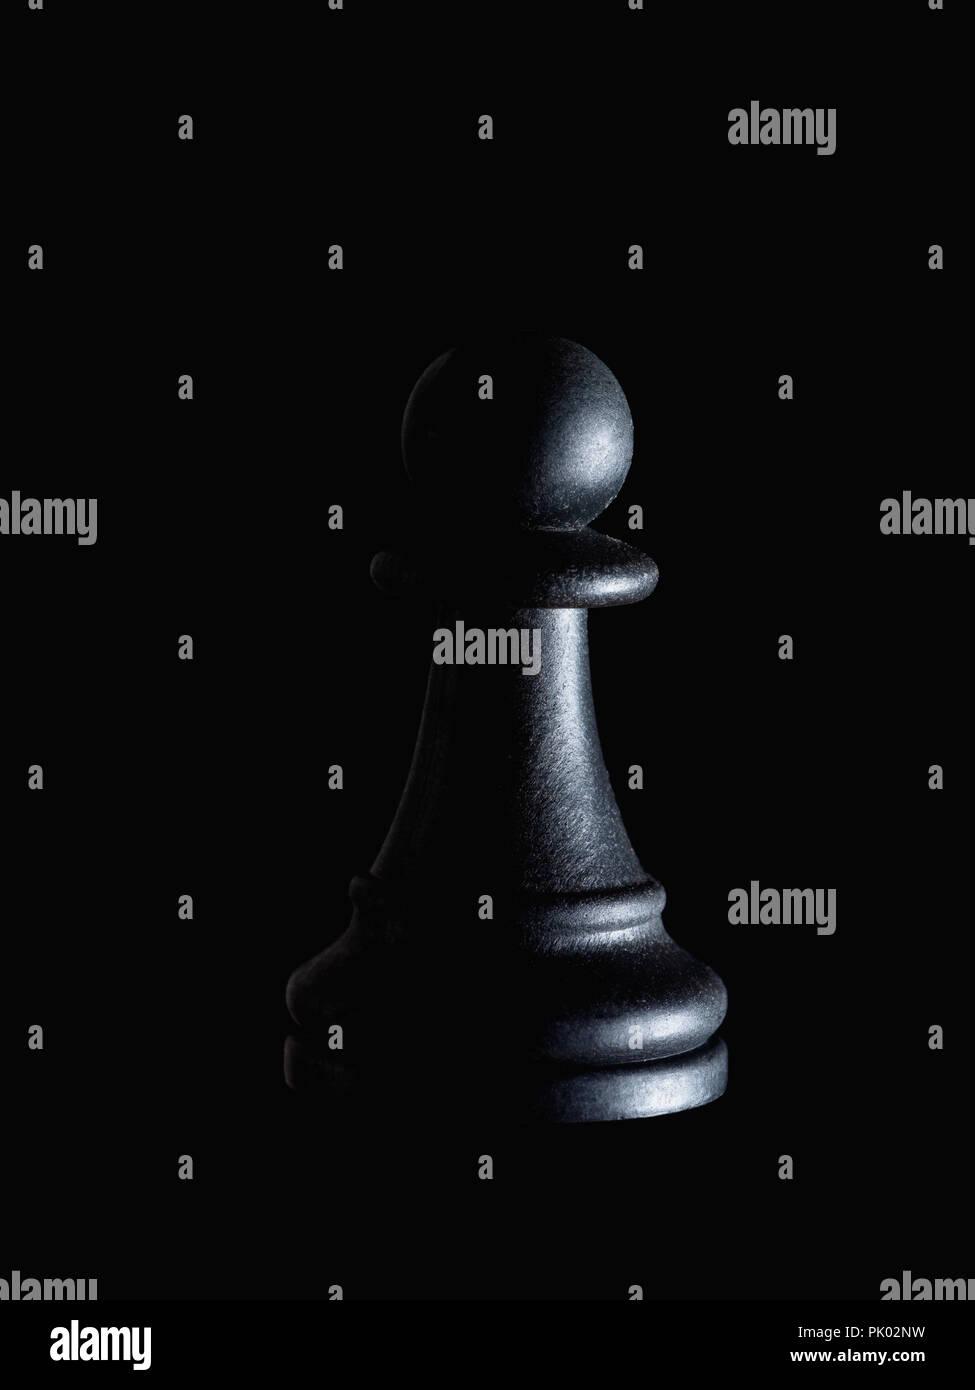 Single black chess piece pawn on black, dramatic lighting. Manipulation, powerlessness, hidden victim concept. - Stock Image